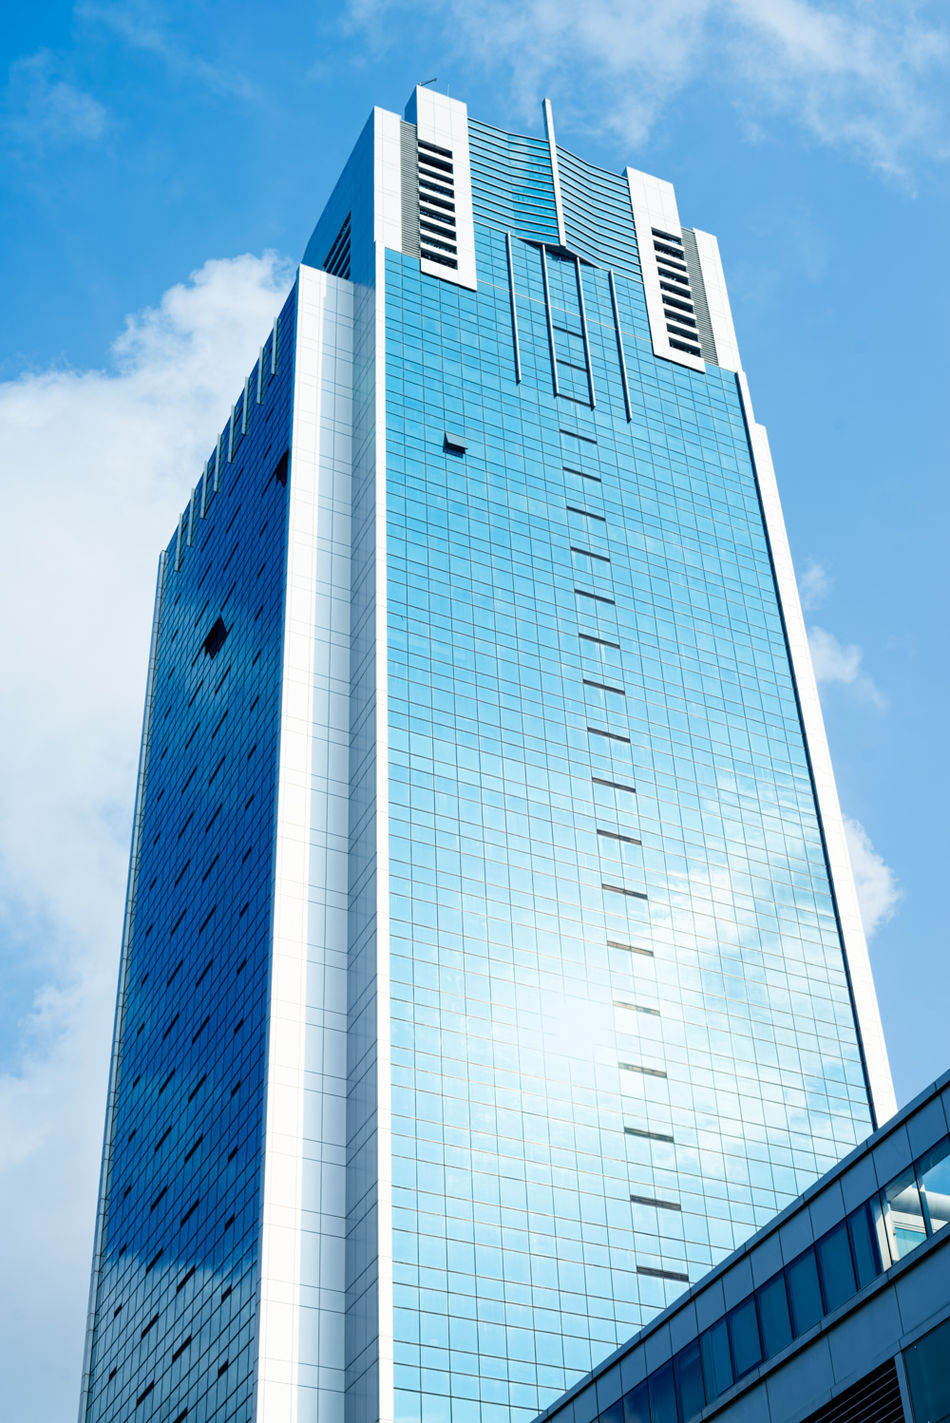 High Street Centre, Singapore. Architecture_collection Architecture High Street Centre Blue Windows Blue Sky